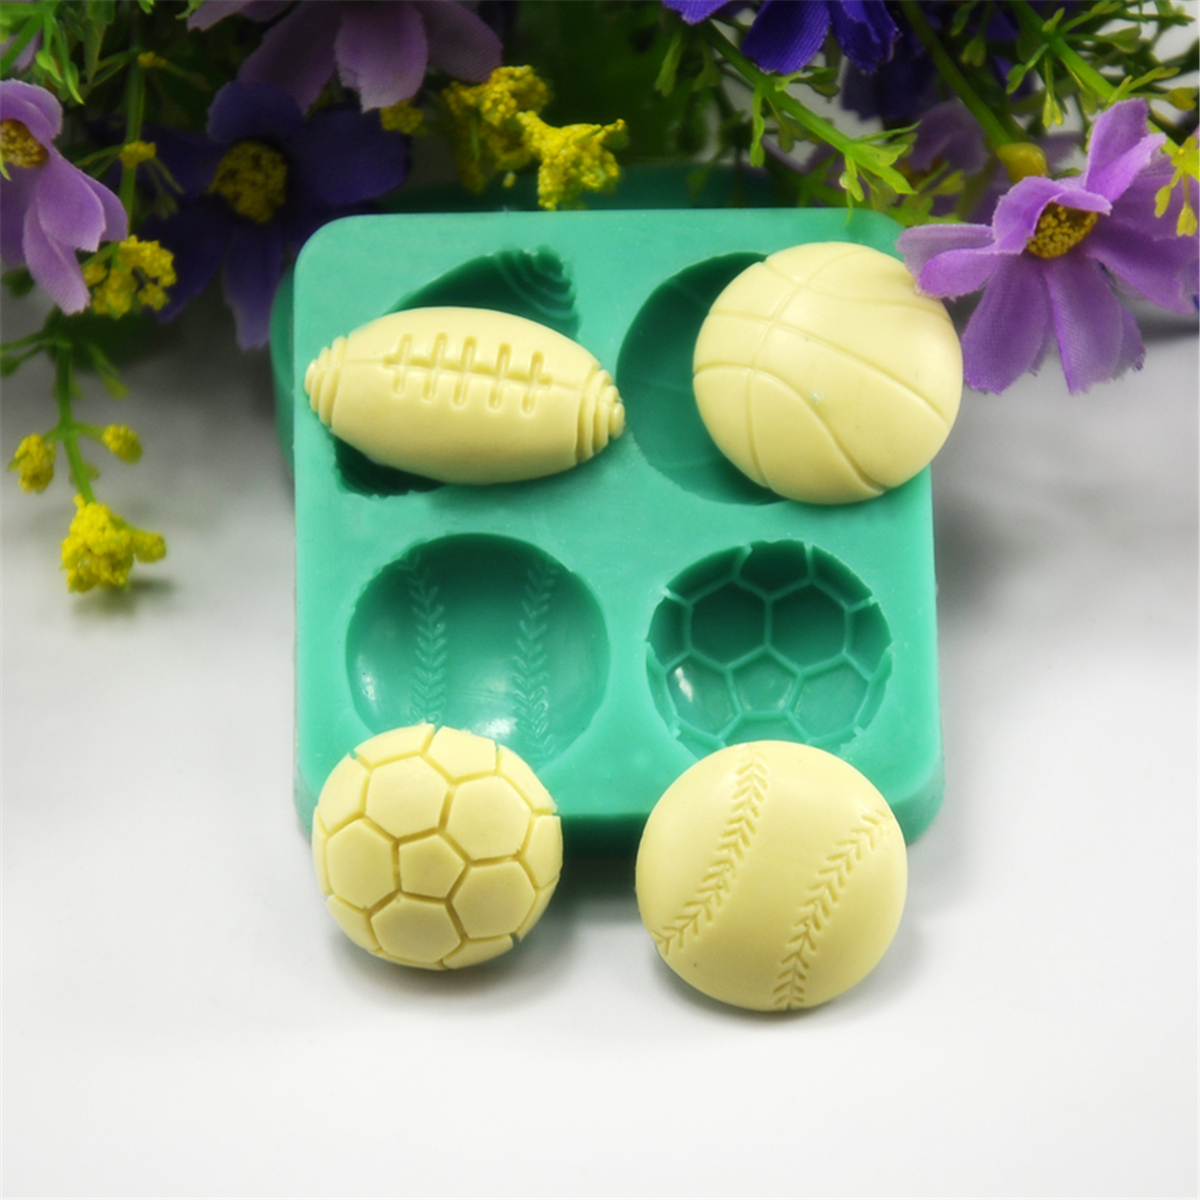 3D Silicone Football Basketball Fondant Mold Cake Sugar Chocolate Baking Tool Baking Mold